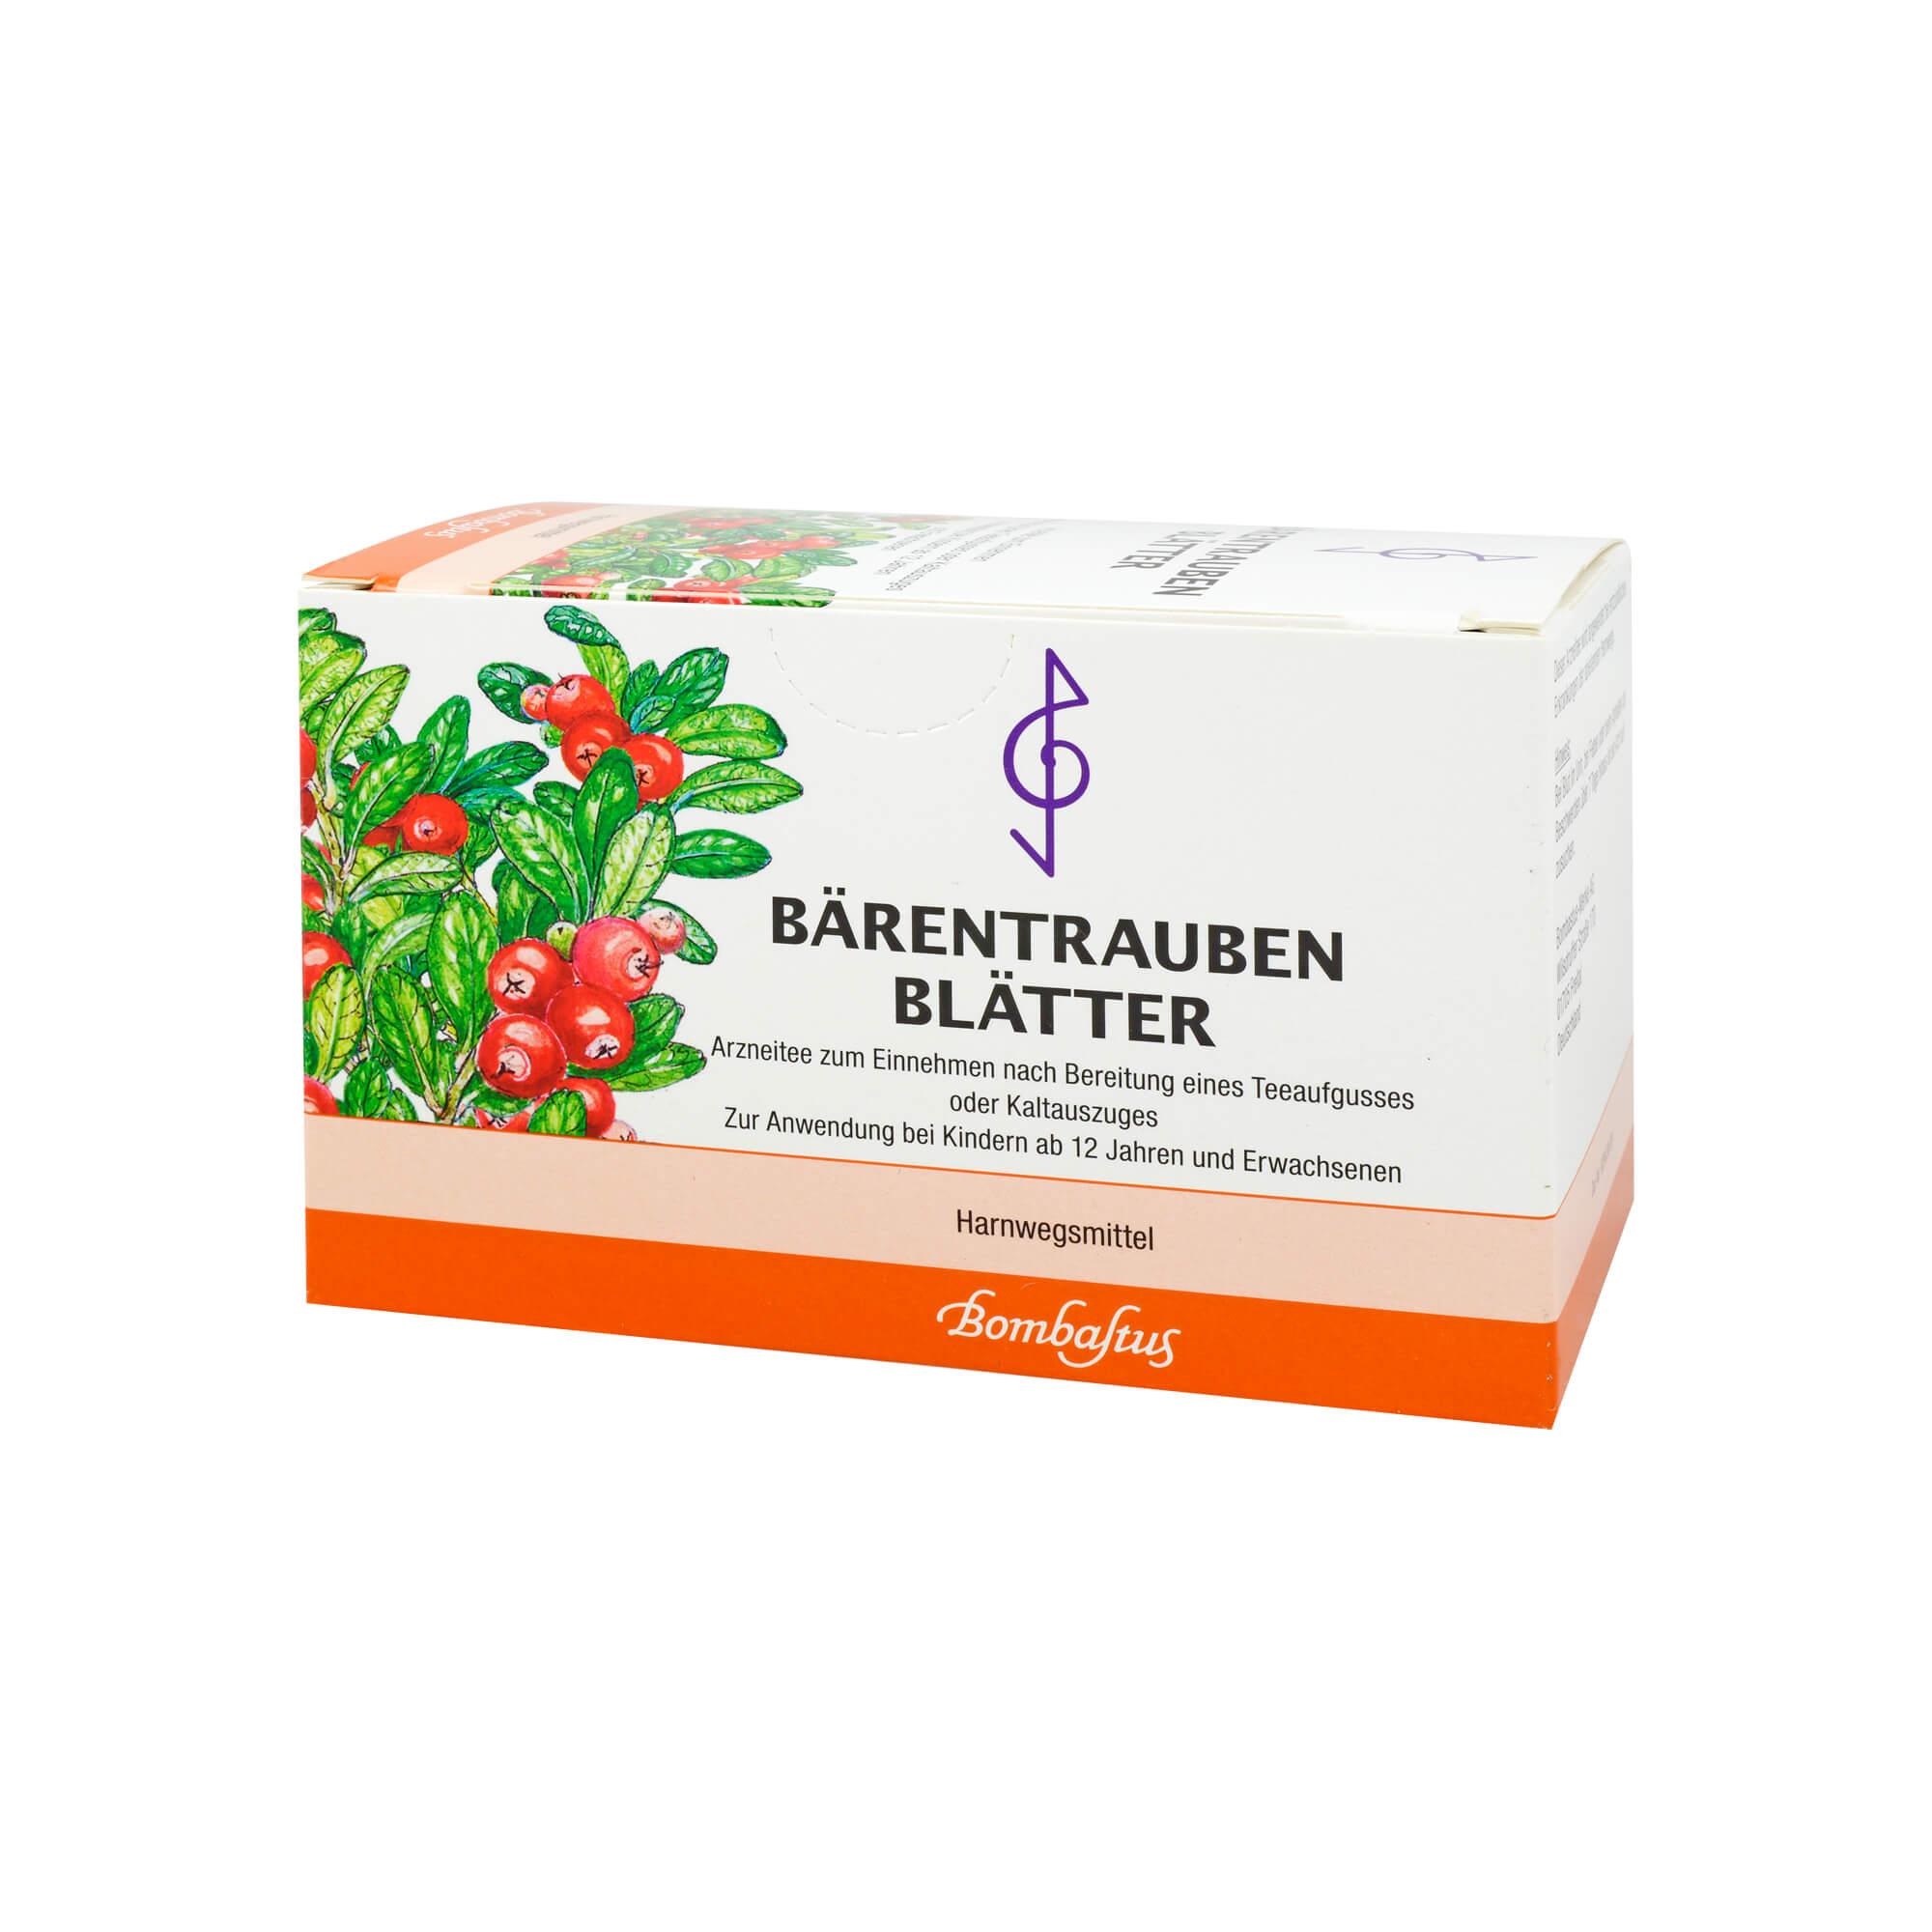 Bärentraubenblätter Tee